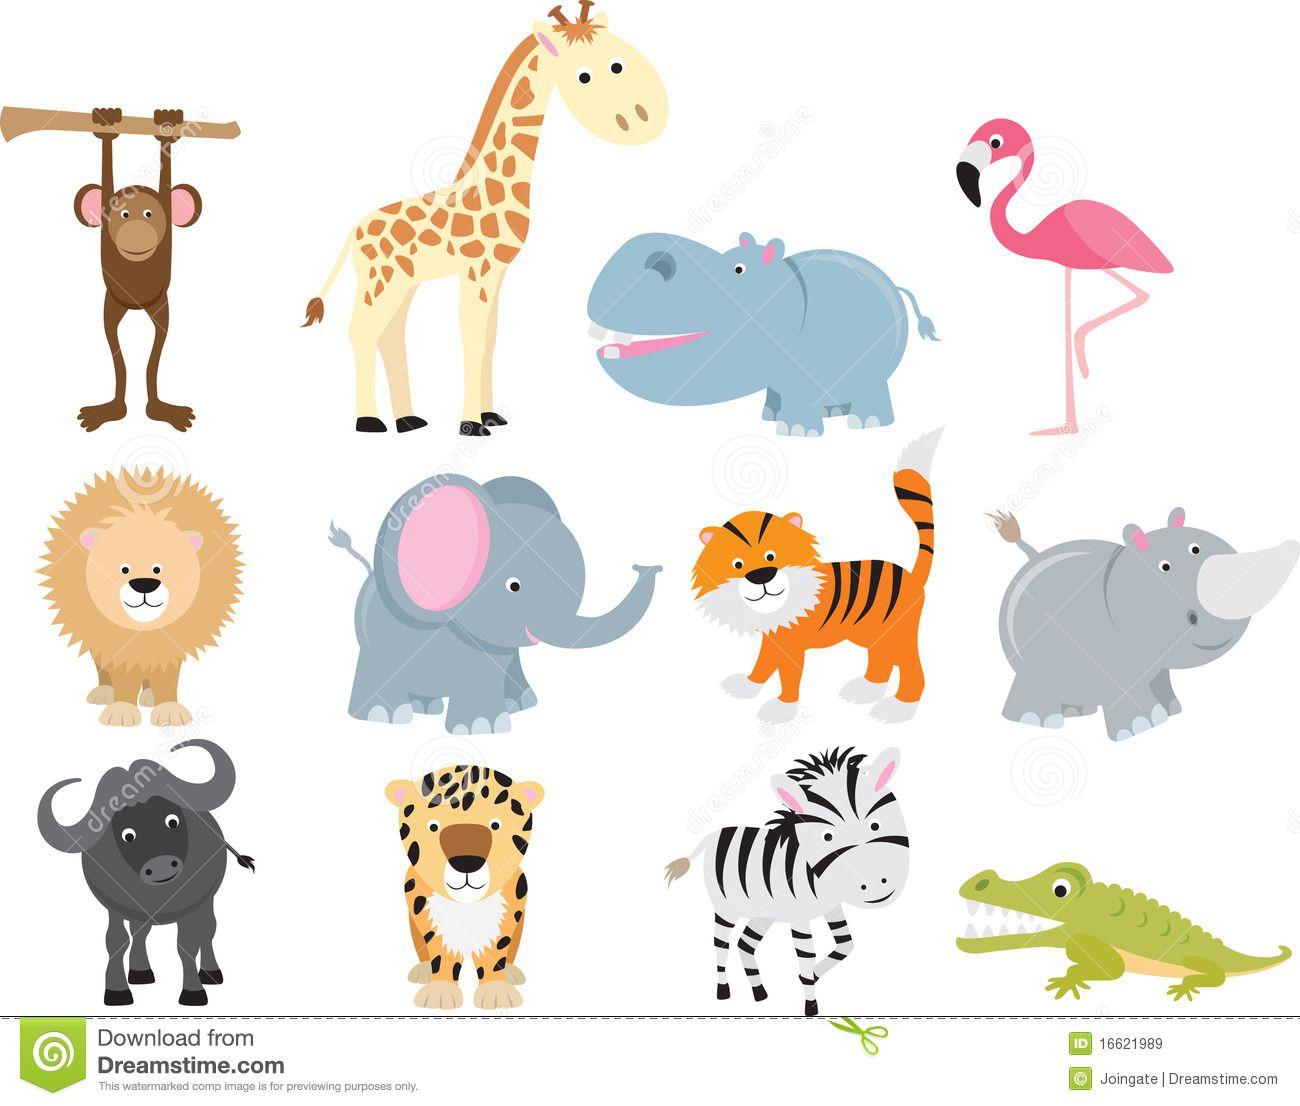 Cute animals mod - Cute Wild Safari Animal Cartoon Set Download From Over 49 Million High Quality Stock Photos